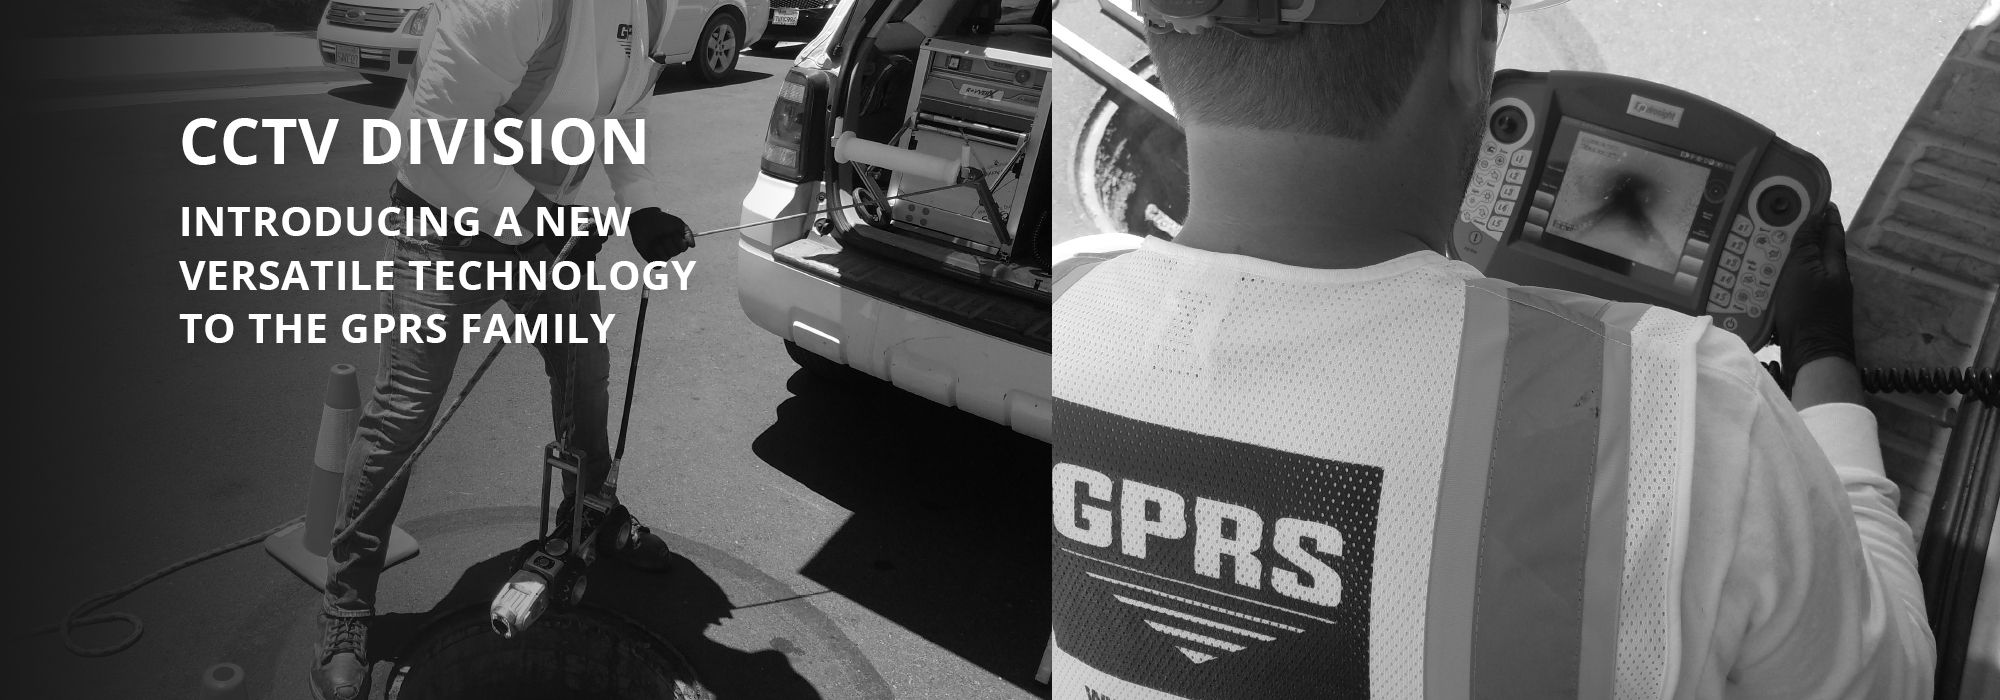 GPRS CCTV Division